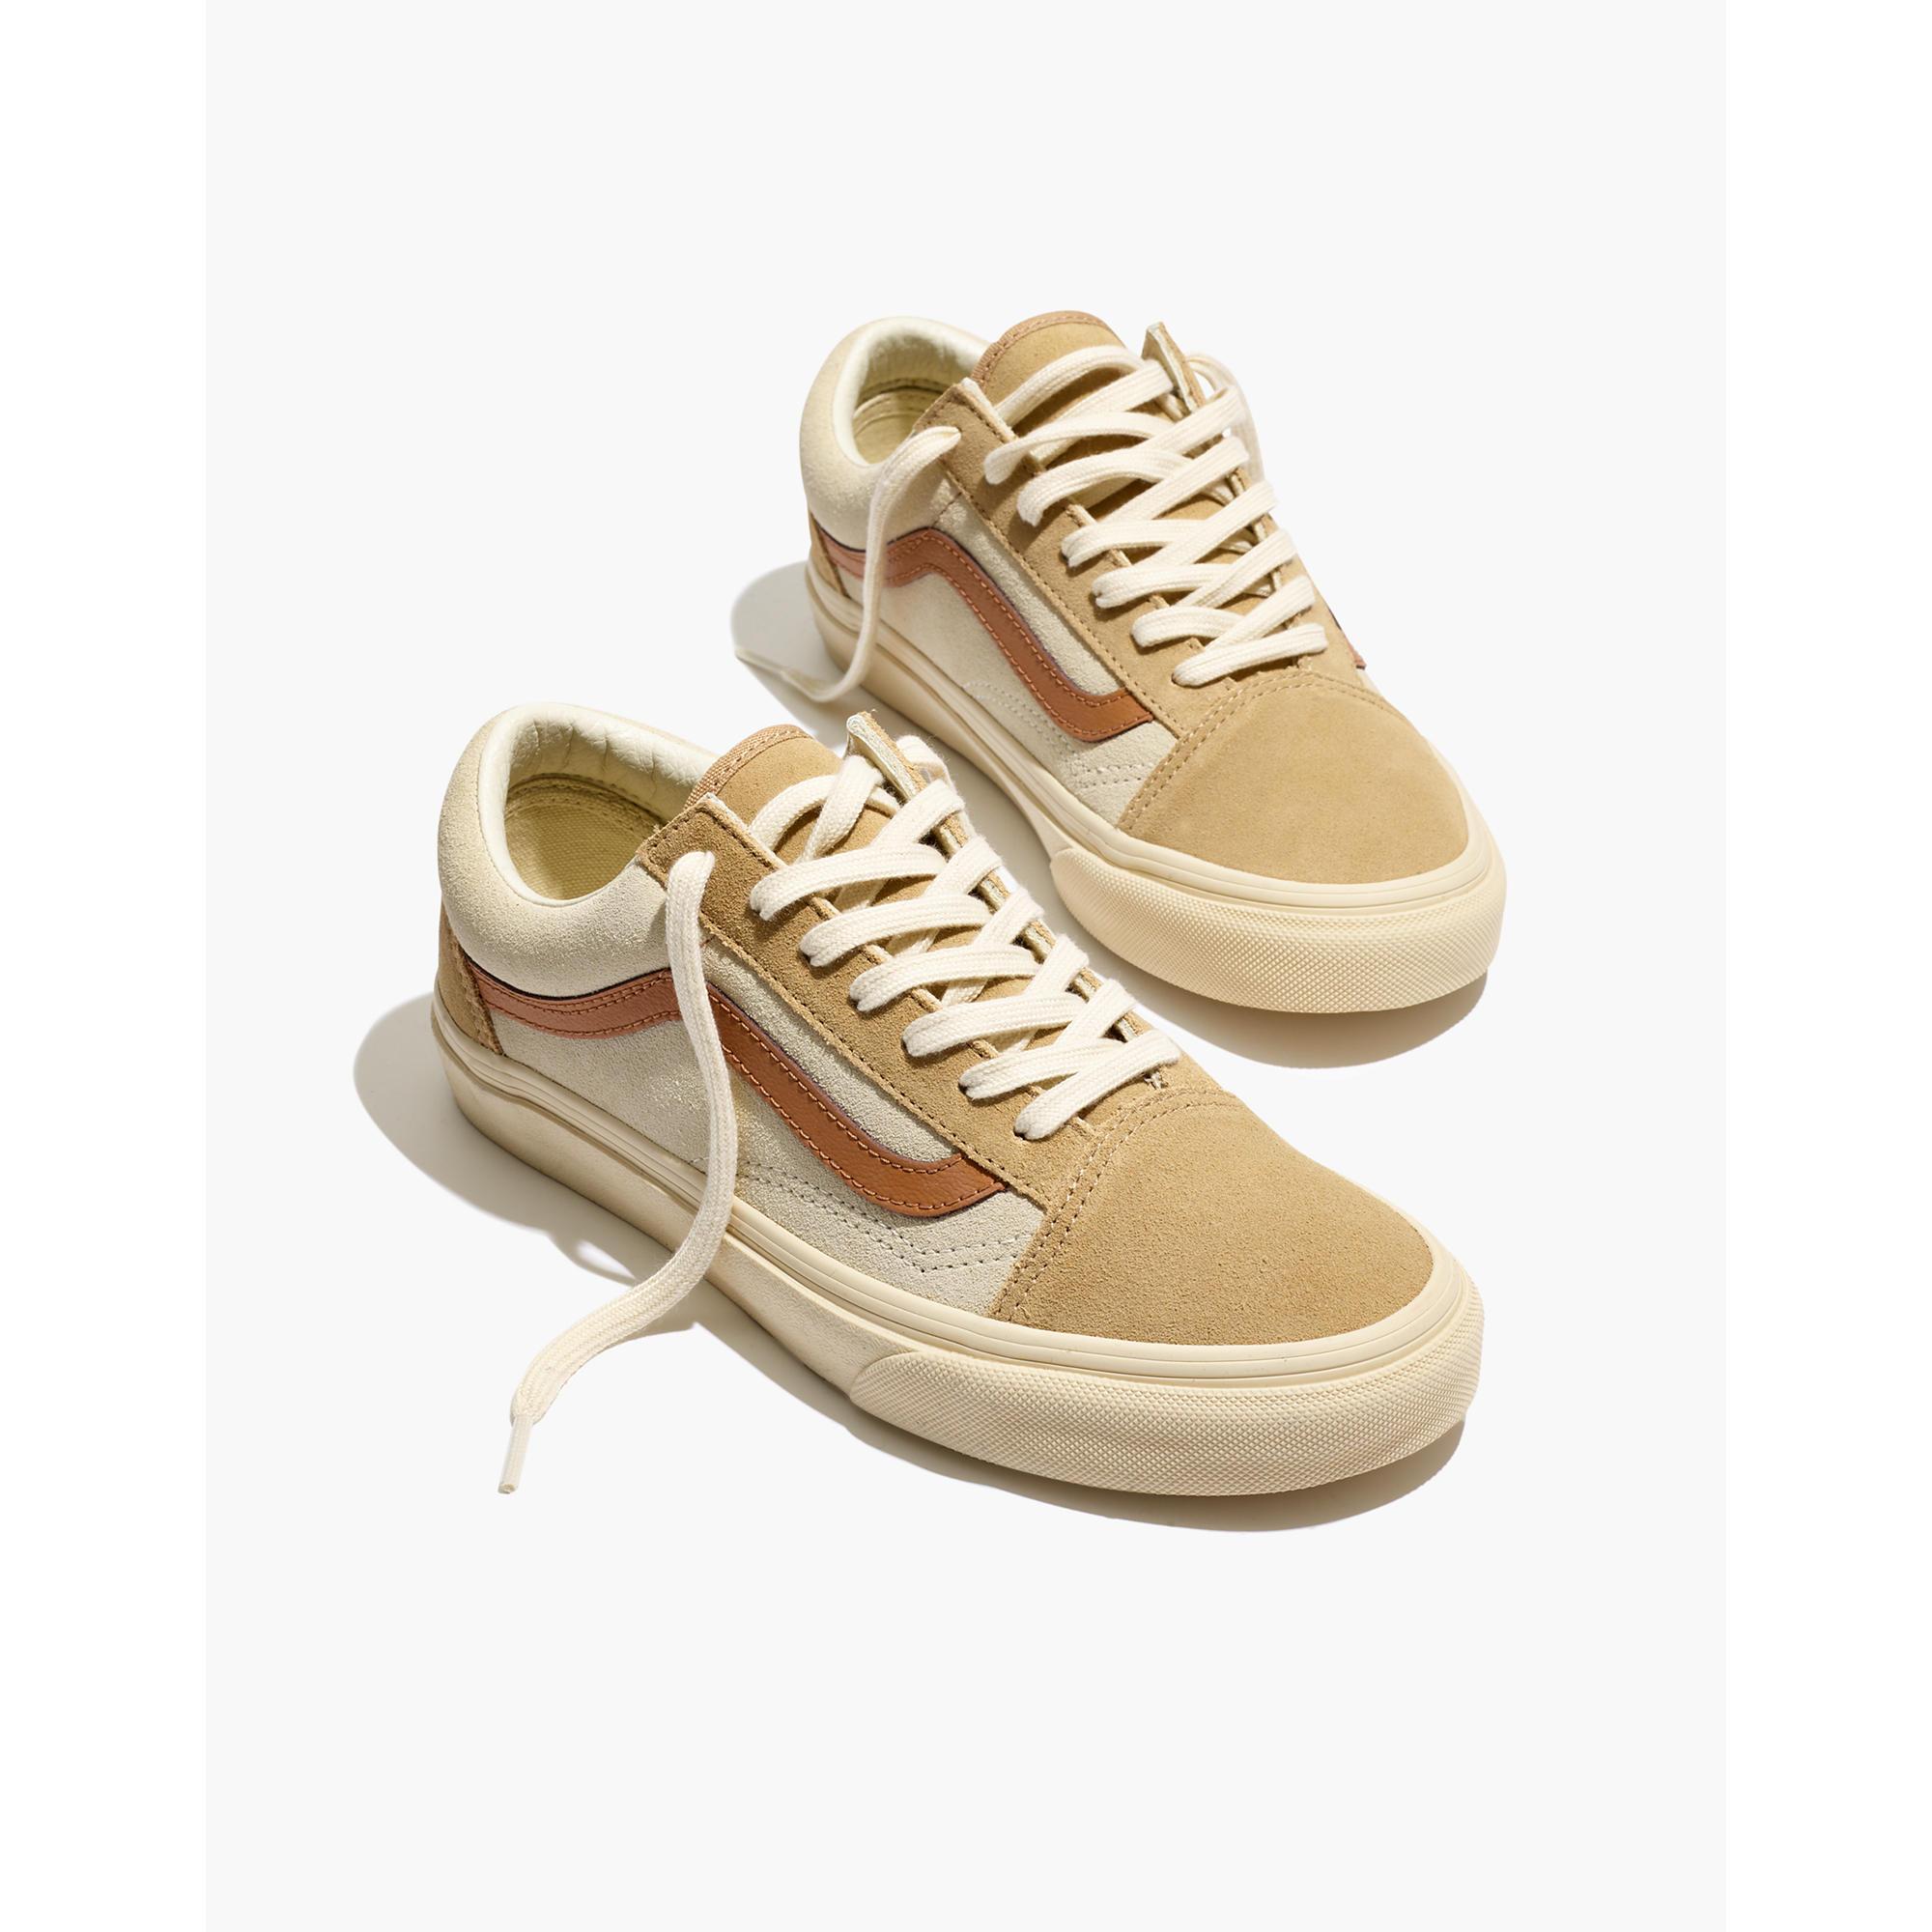 Pre Order Madewell X Vans Unisex Old Skool Lace Up Sneakers In Inside Flats Joyce Pink Camel Colorblock